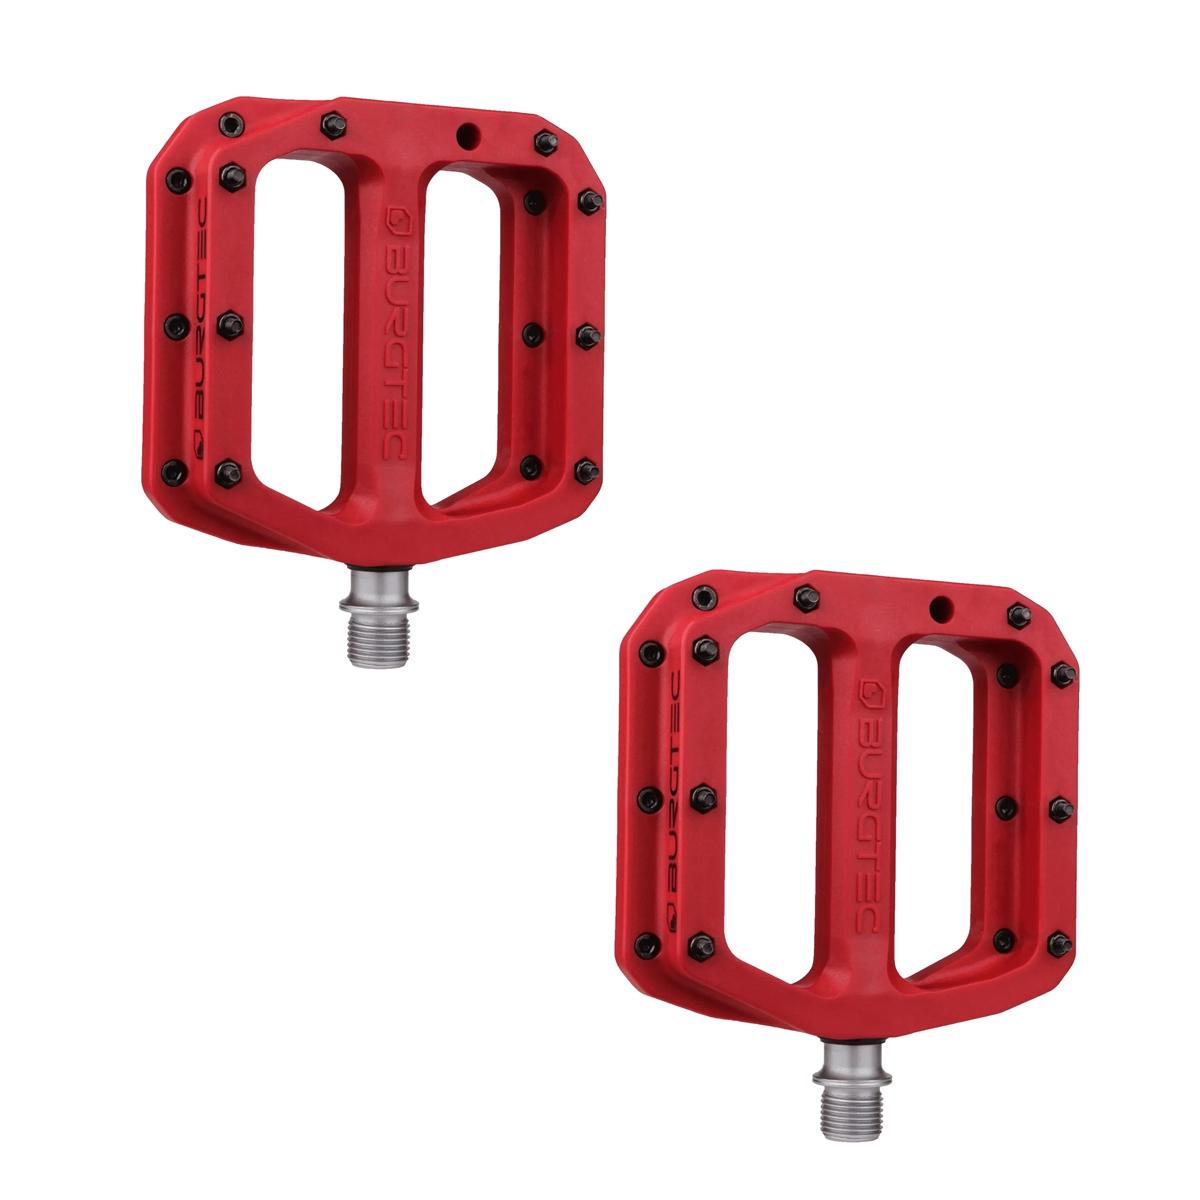 Flat Pedals Set MK4 Composite 1502 Red